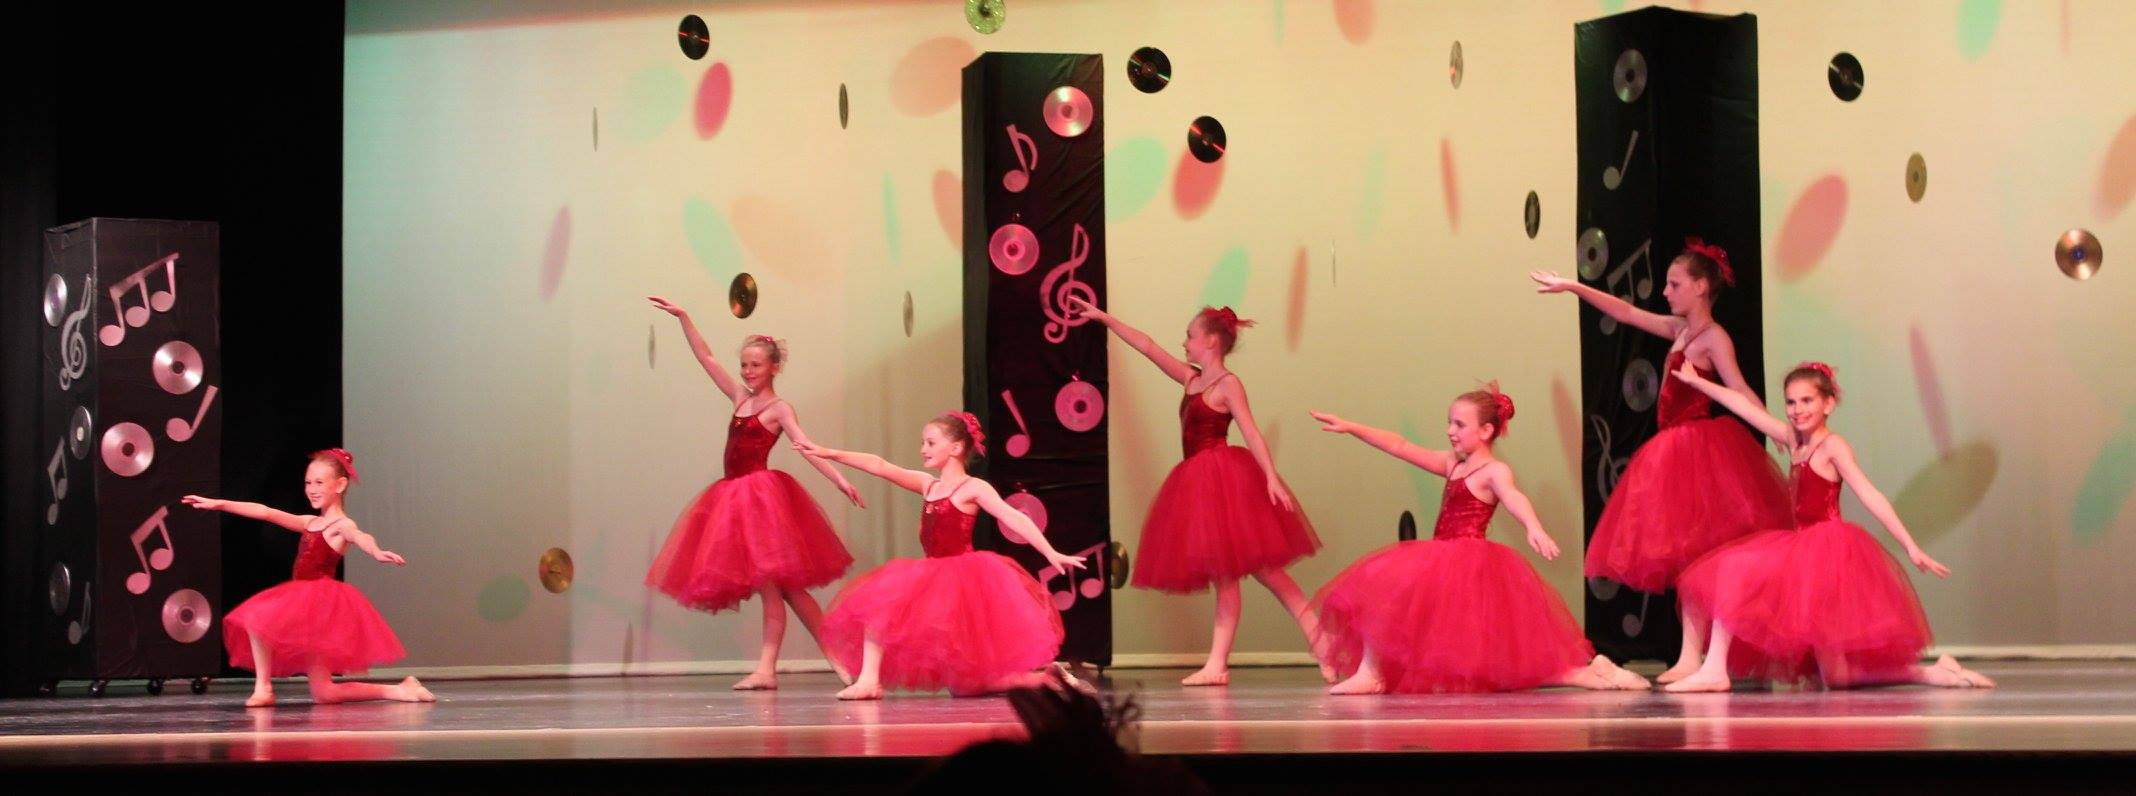 jade-ballet